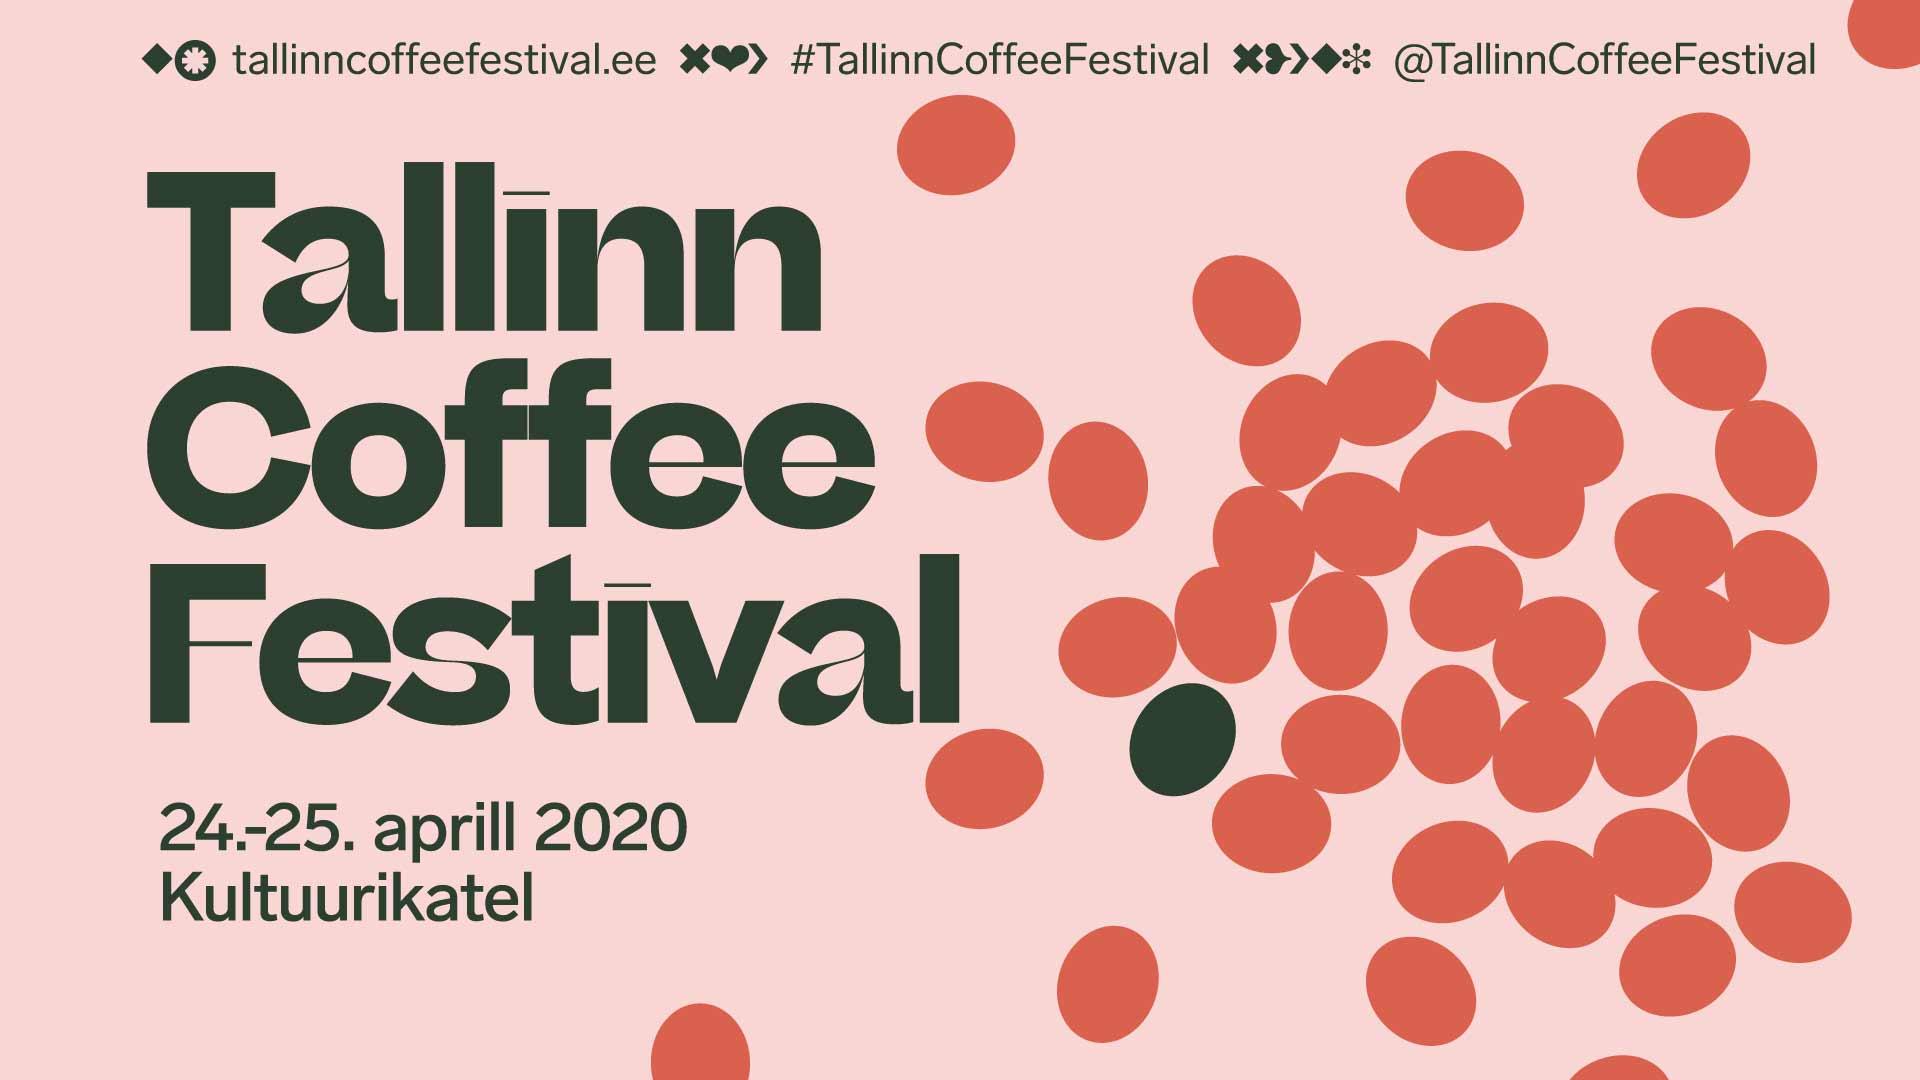 The Tallinn Coffee Festival 2020